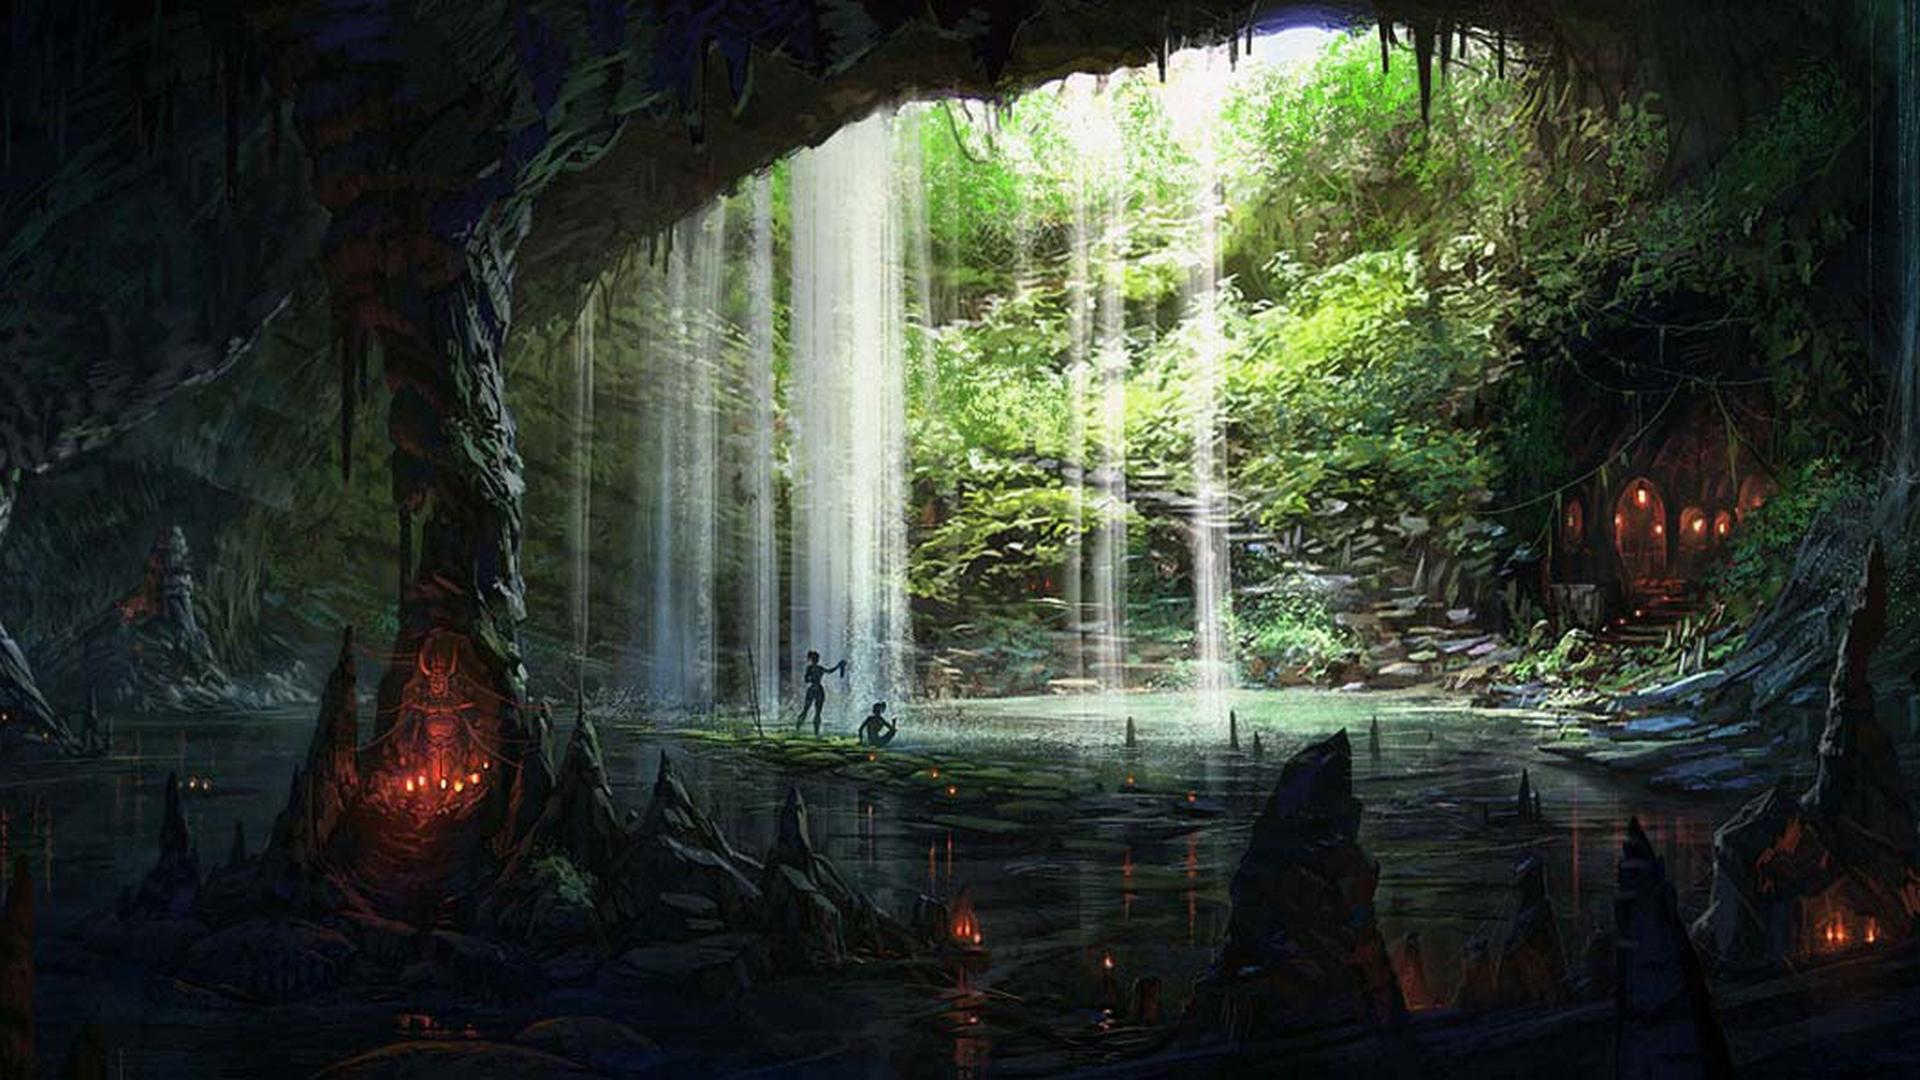 Drawn background cave 1920x1080 Backgrounds Wallpaper Desktop Cave